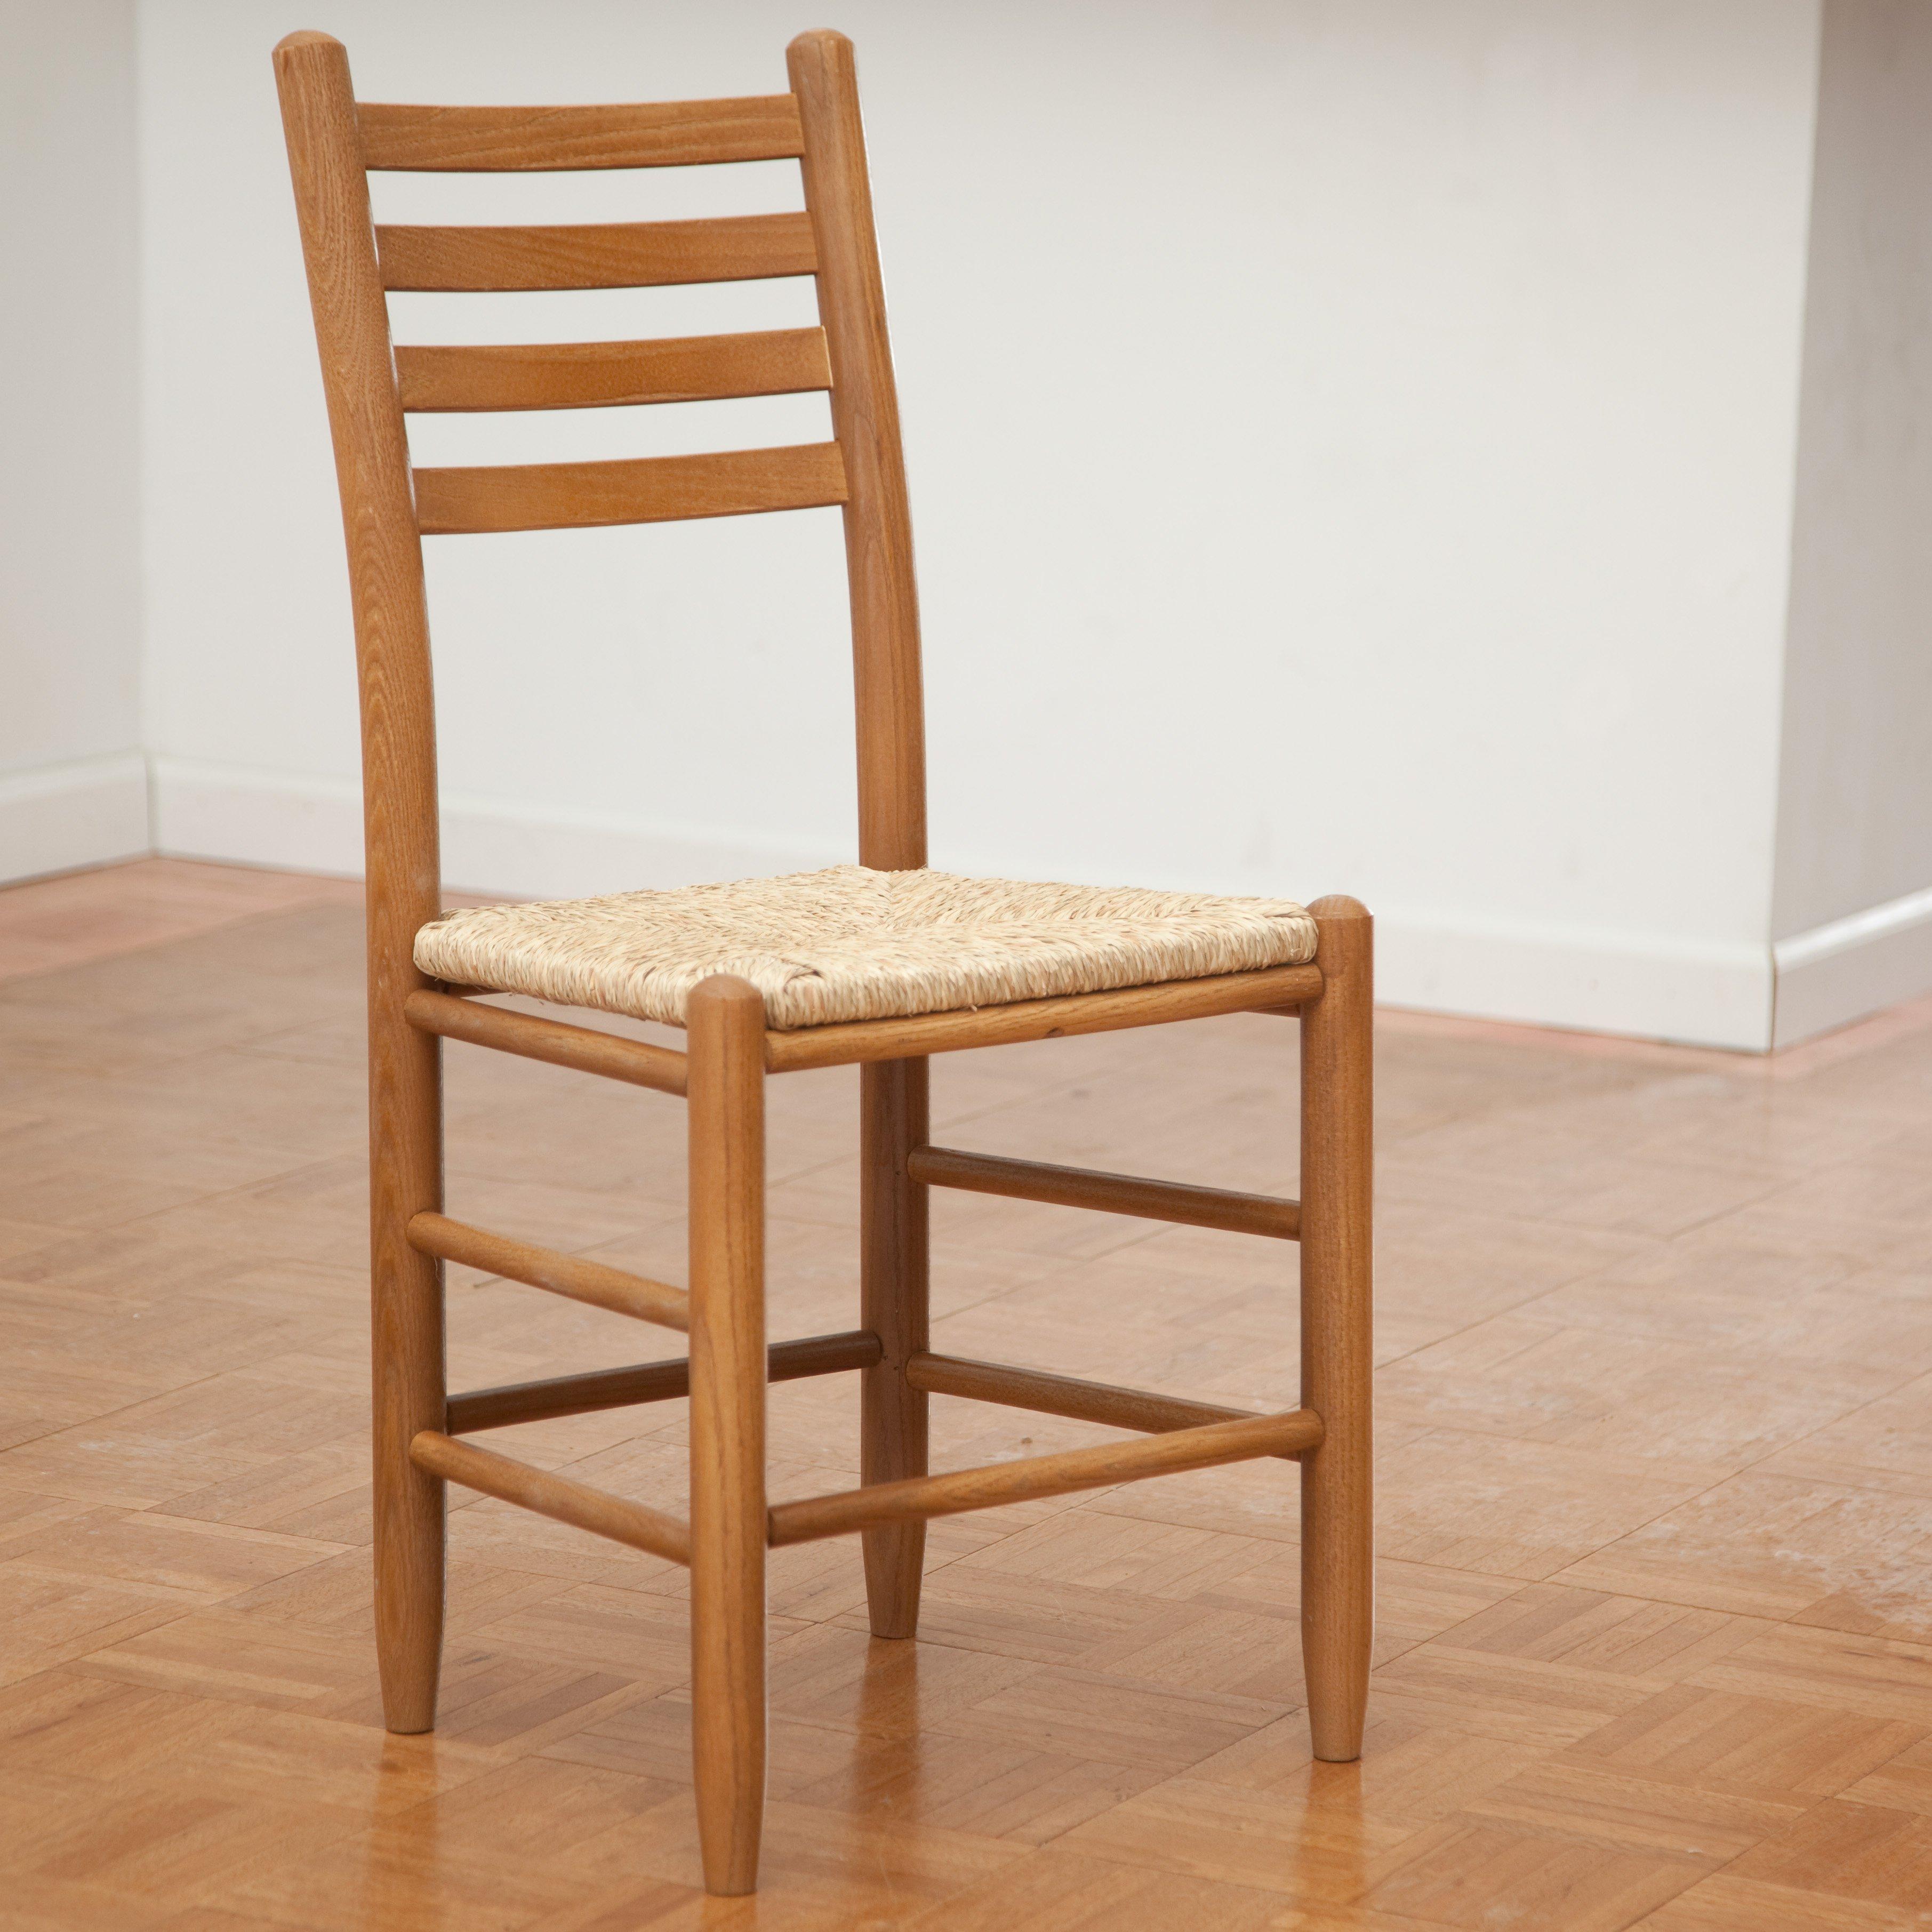 Dixie Seating 4-Slat Steam Bent Ladder Back Chair